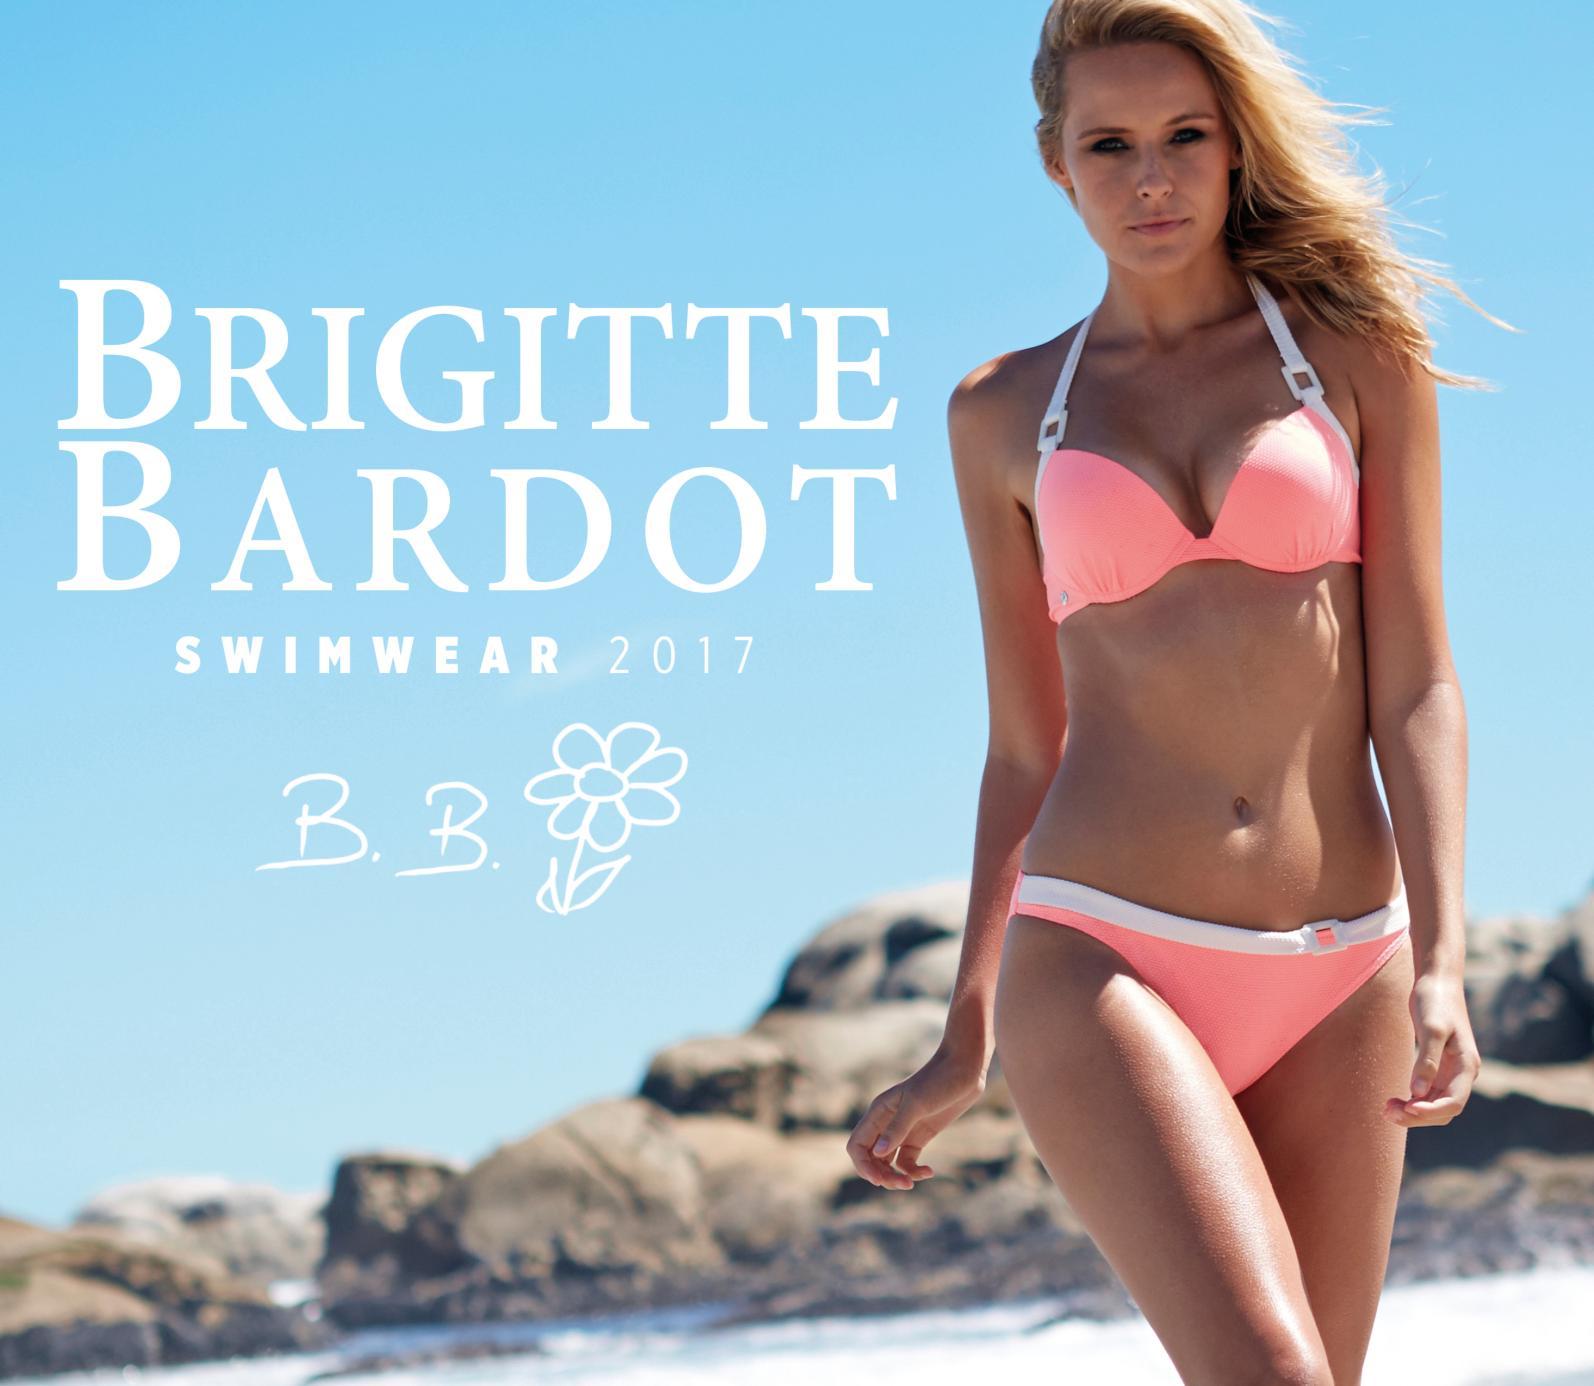 Brigitte BARDOT Swimwear 2017